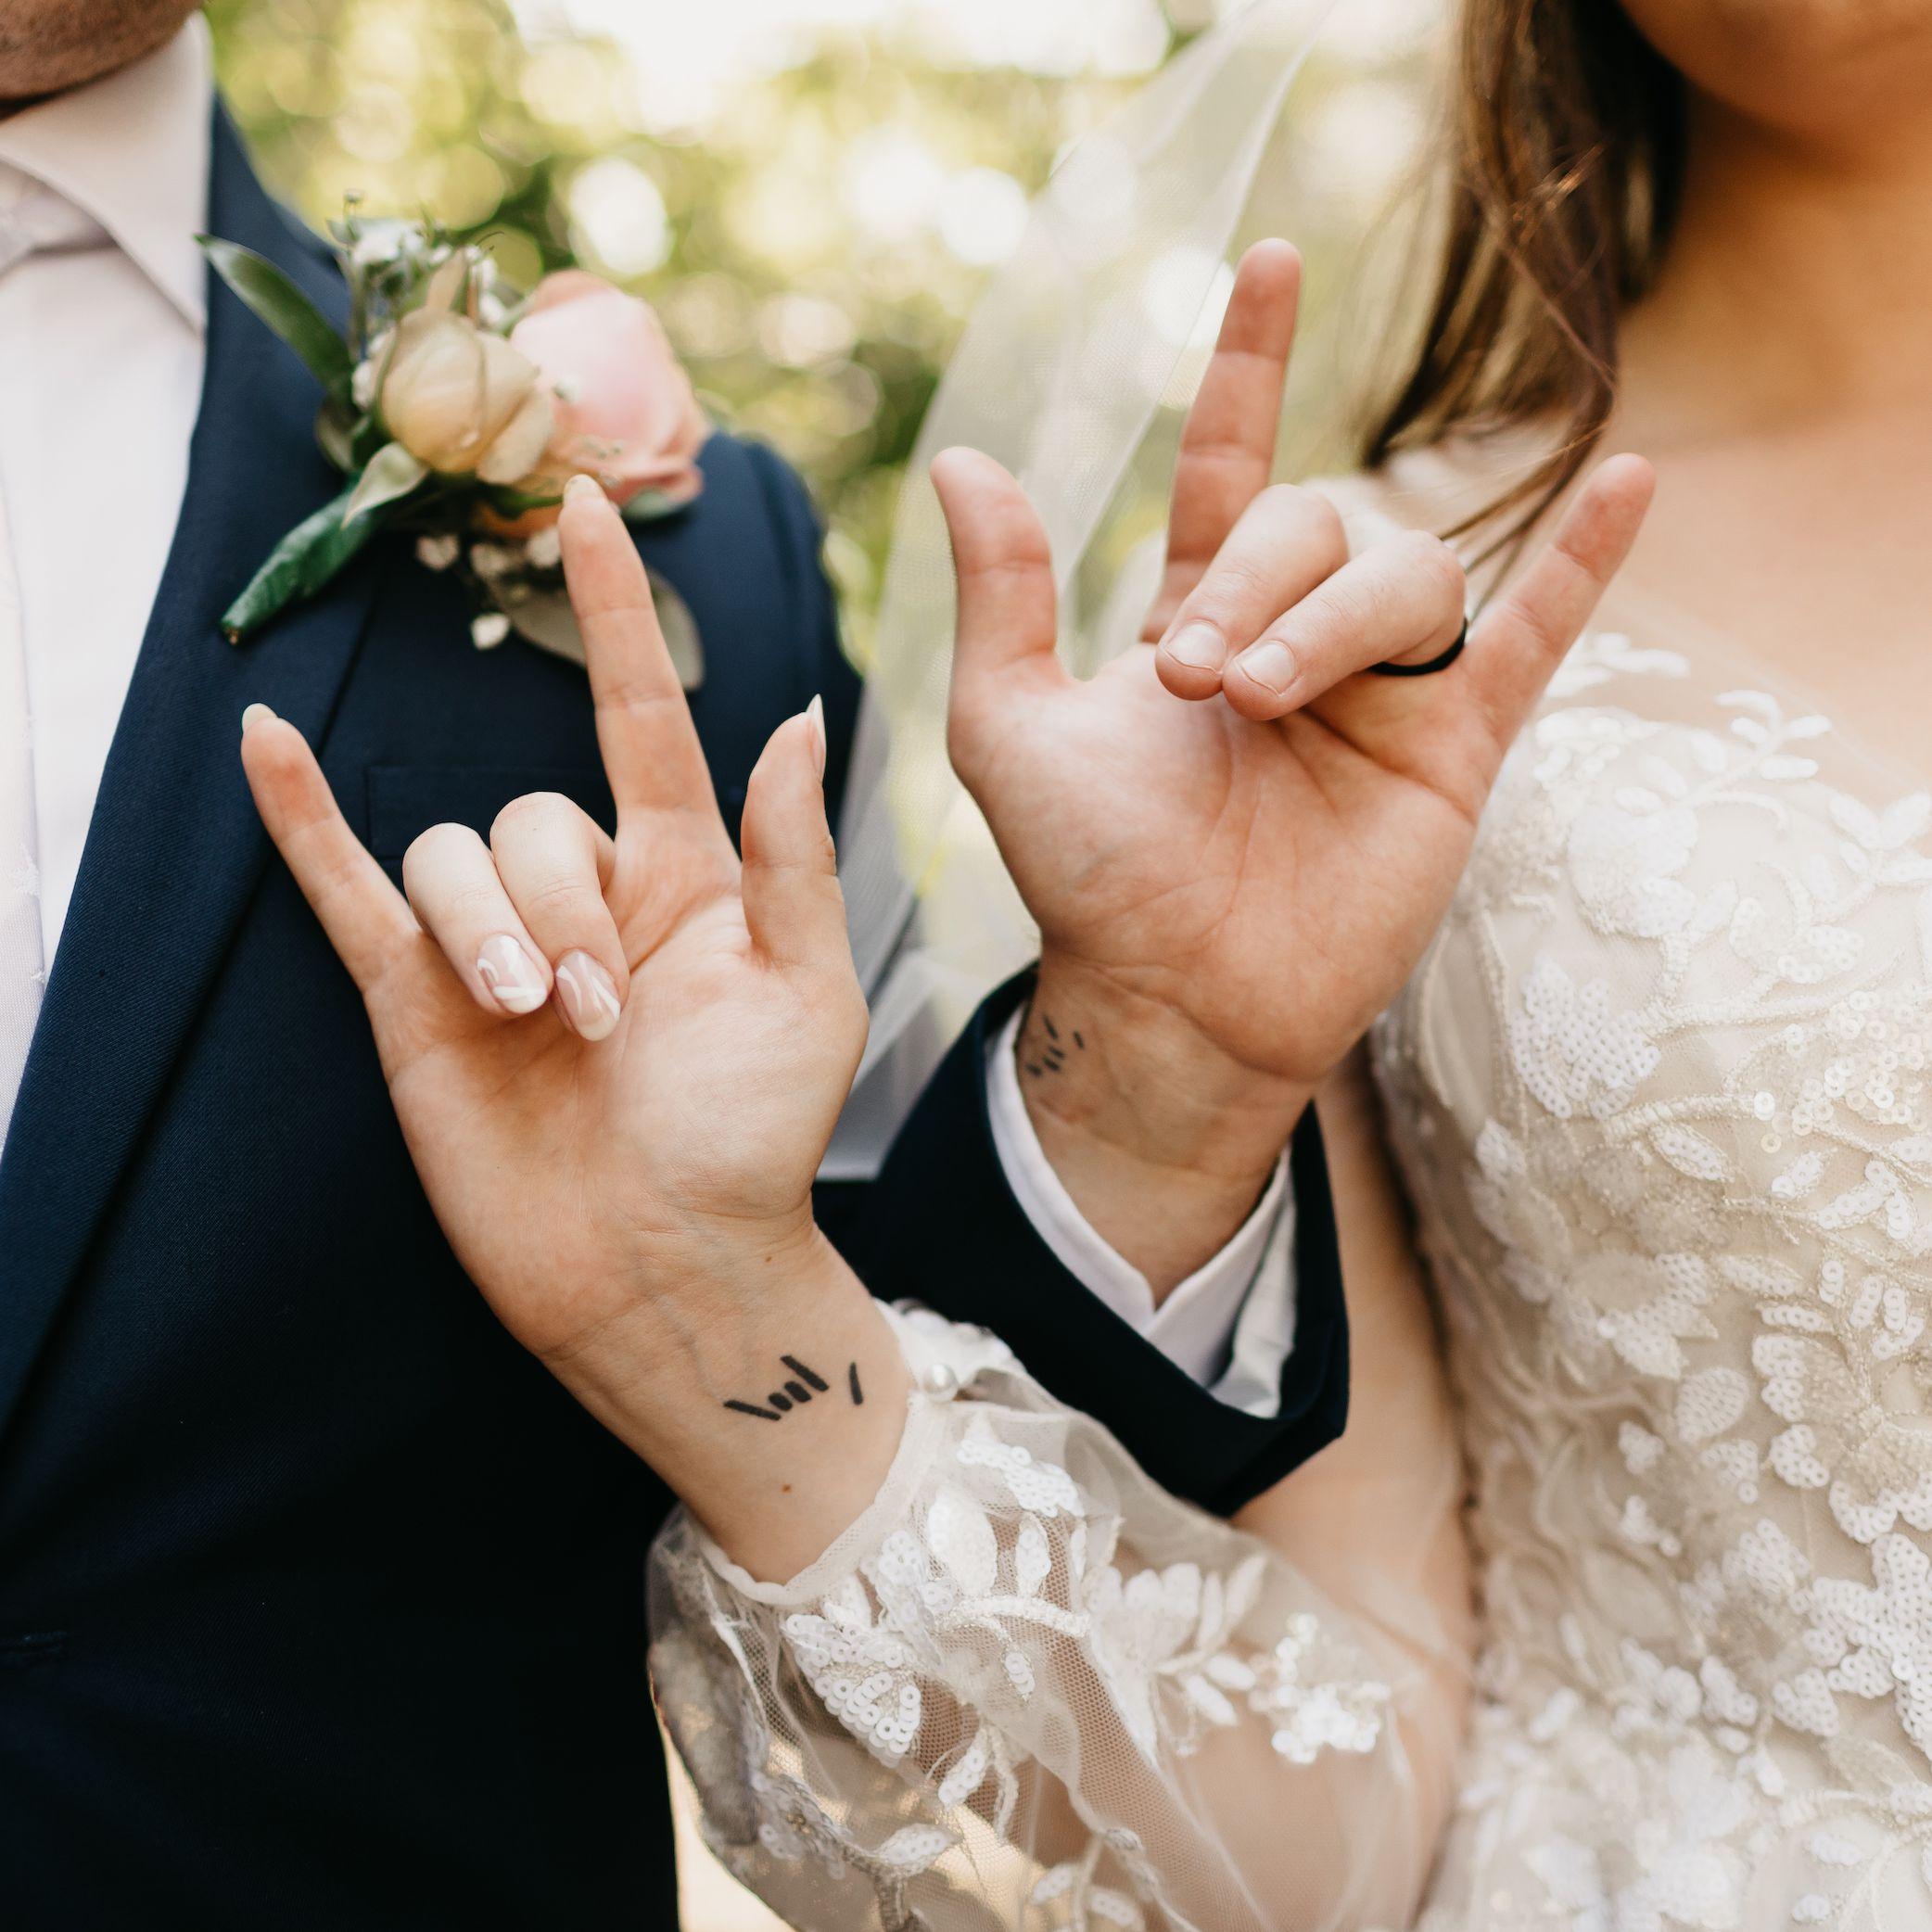 20 Cute Matching Couple Tattoos